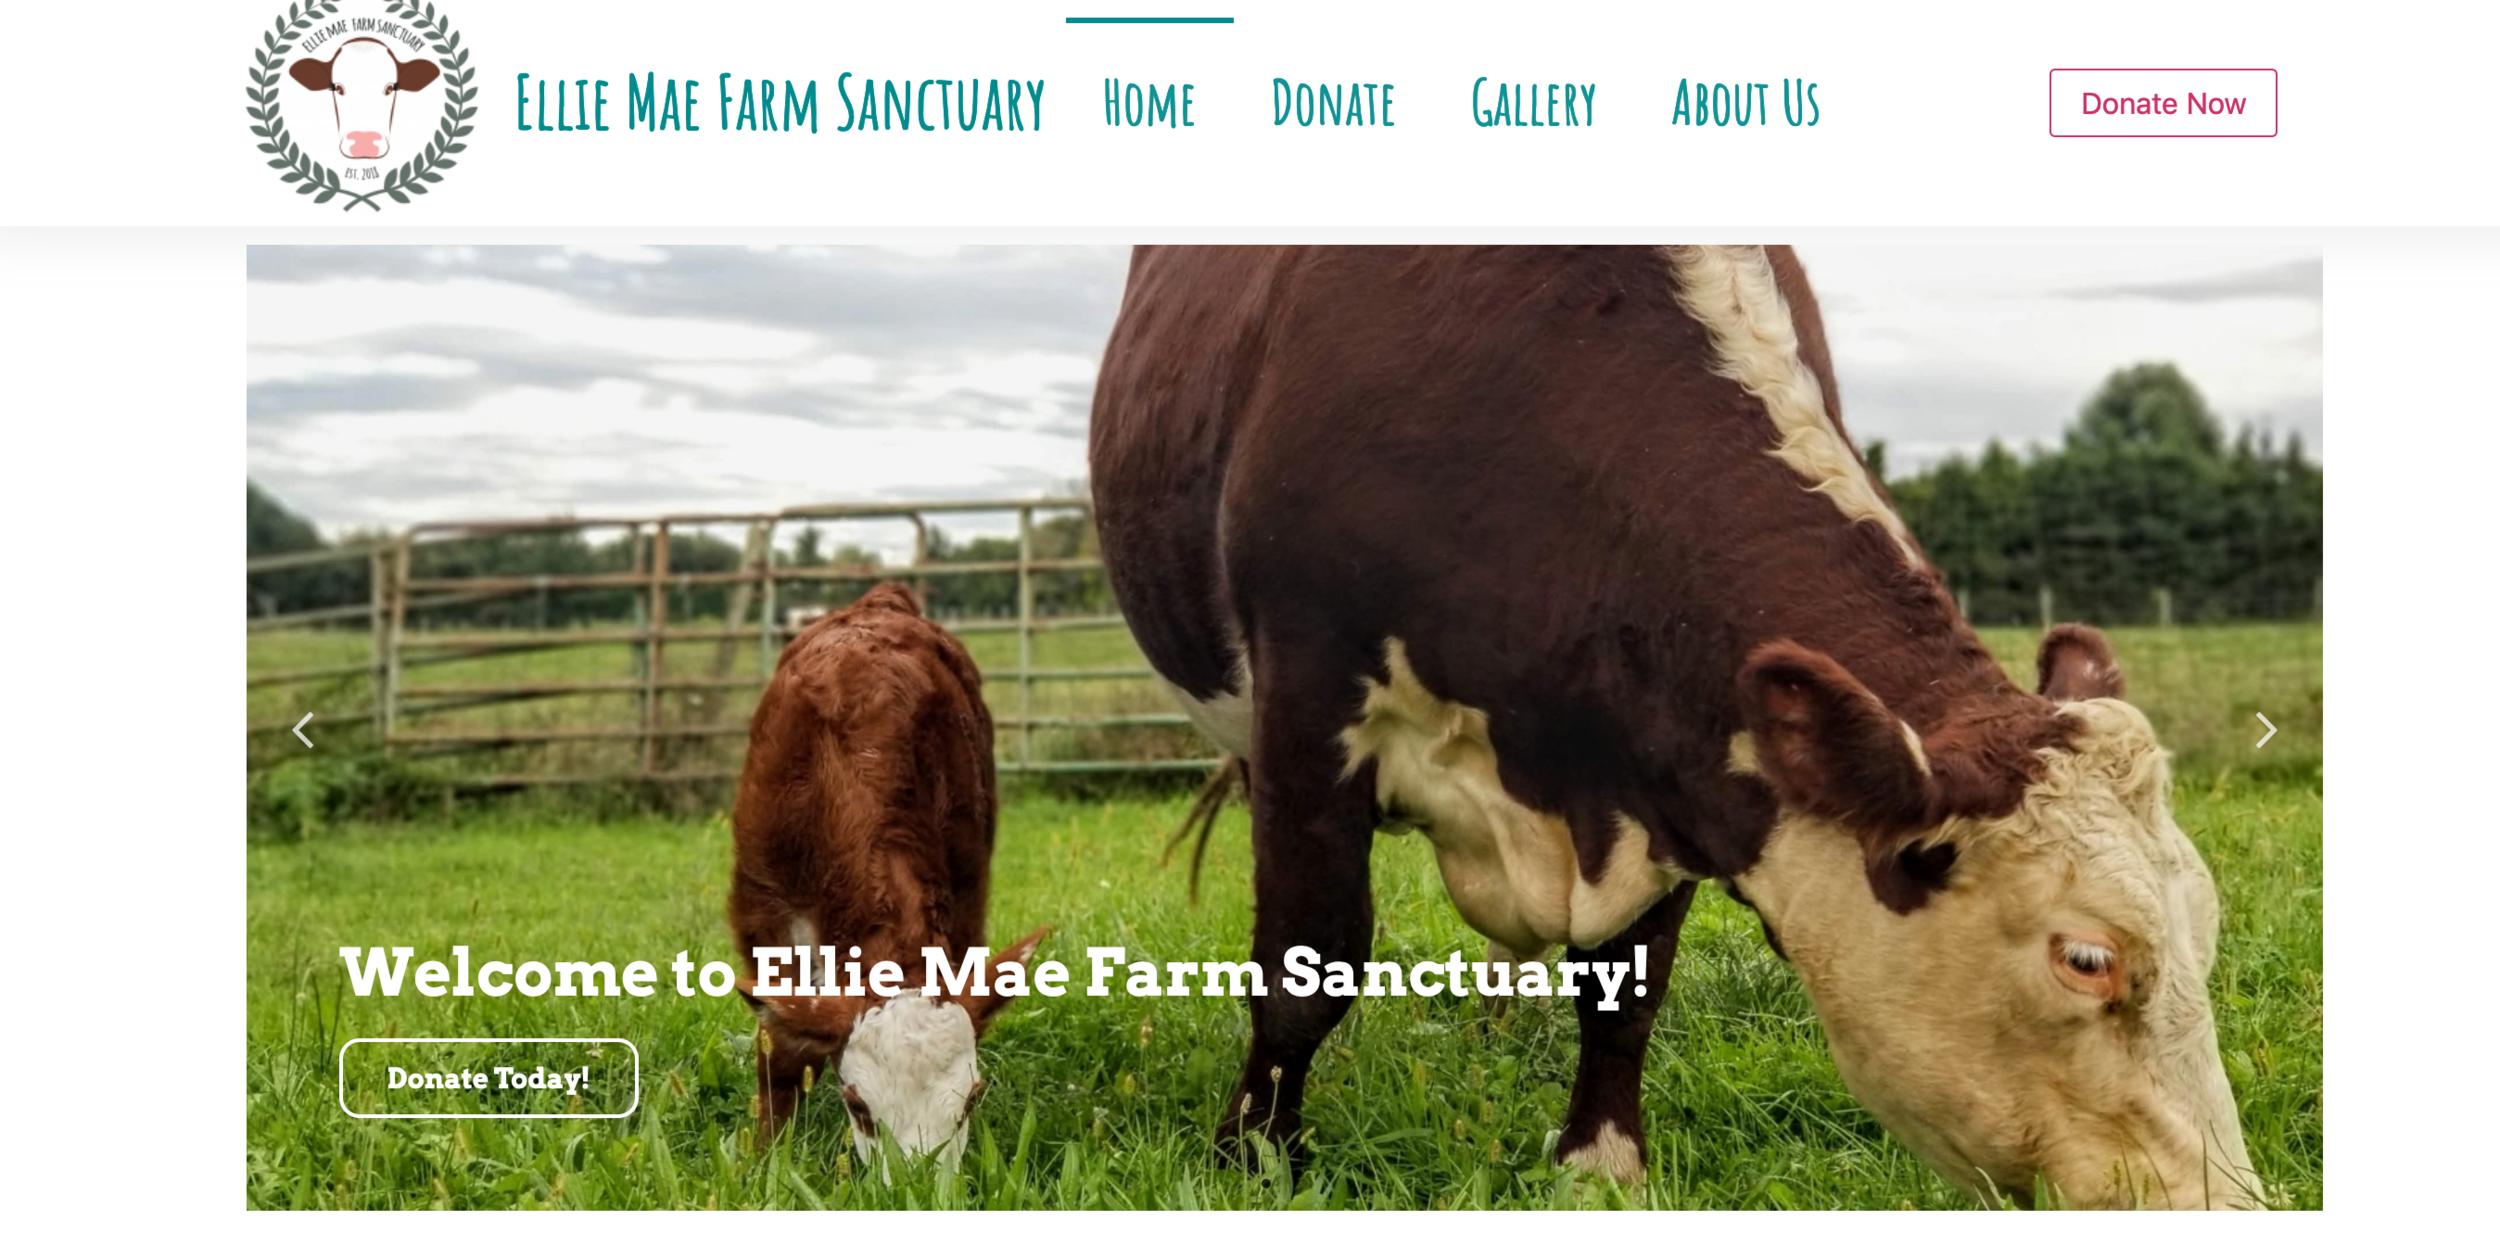 Alum-run Ellie Mae Farm Sanctuary hopes to rescue farm